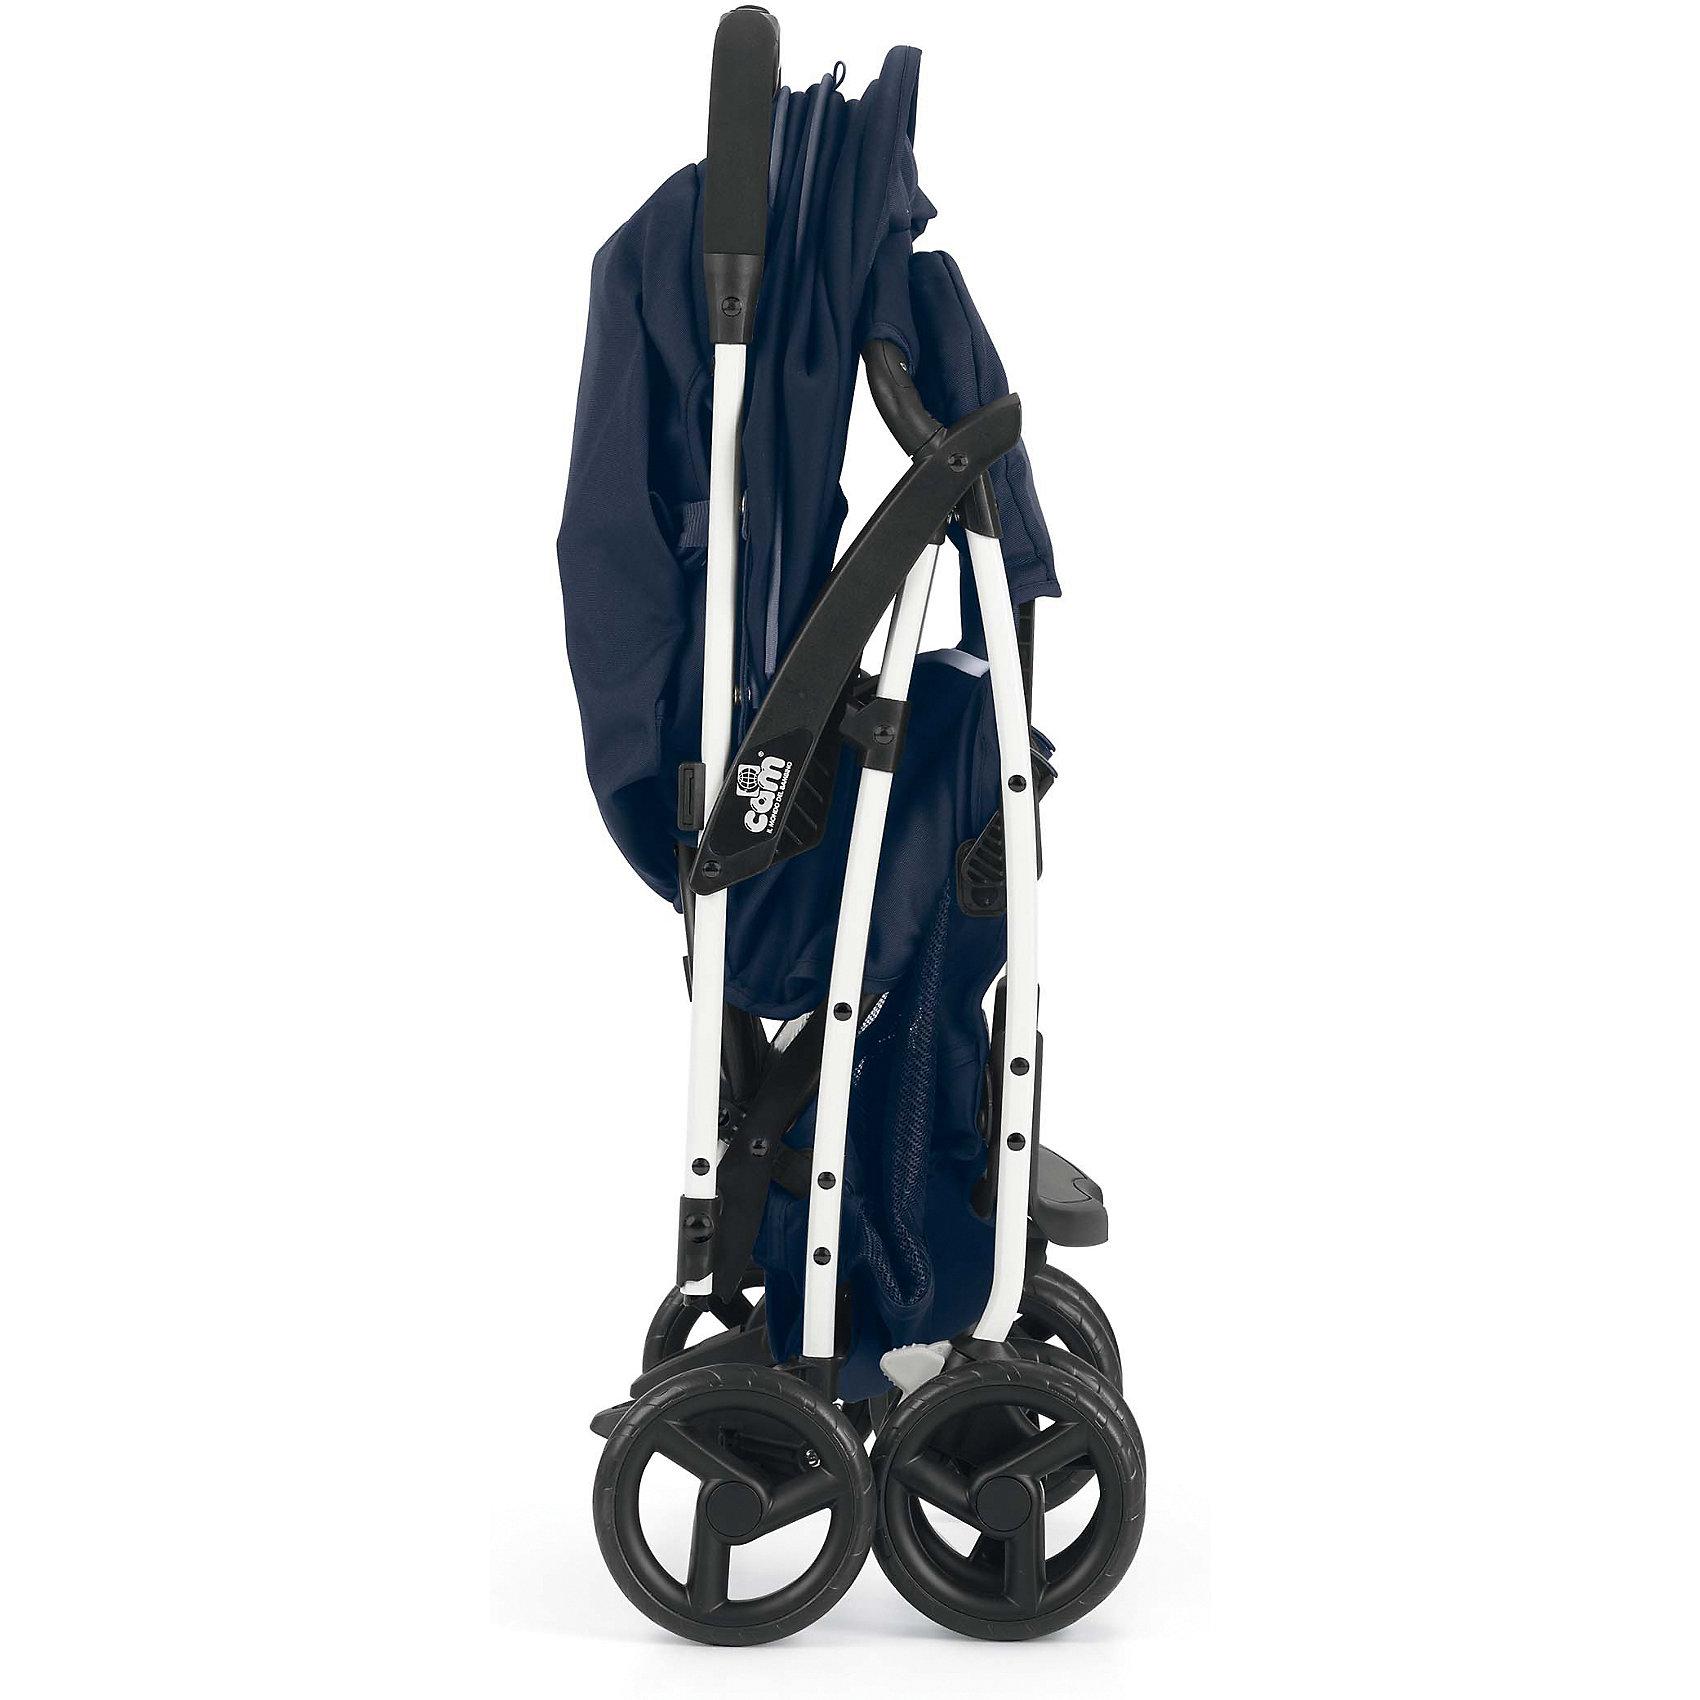 Прогулочная коляска CAM Curvi, серый/розовый